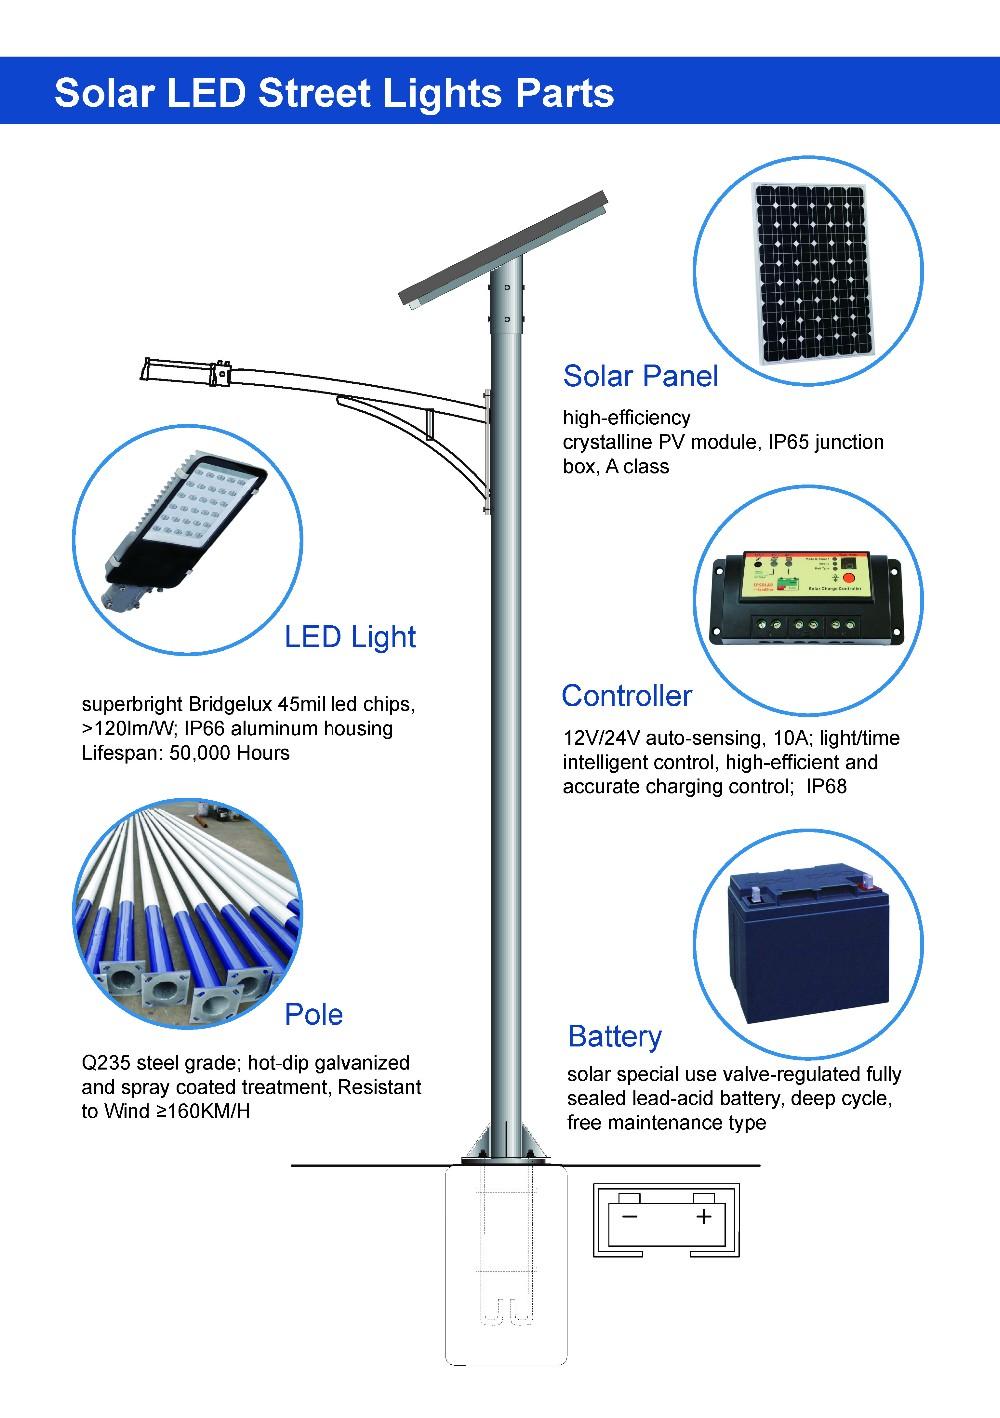 How solar street lights work 65